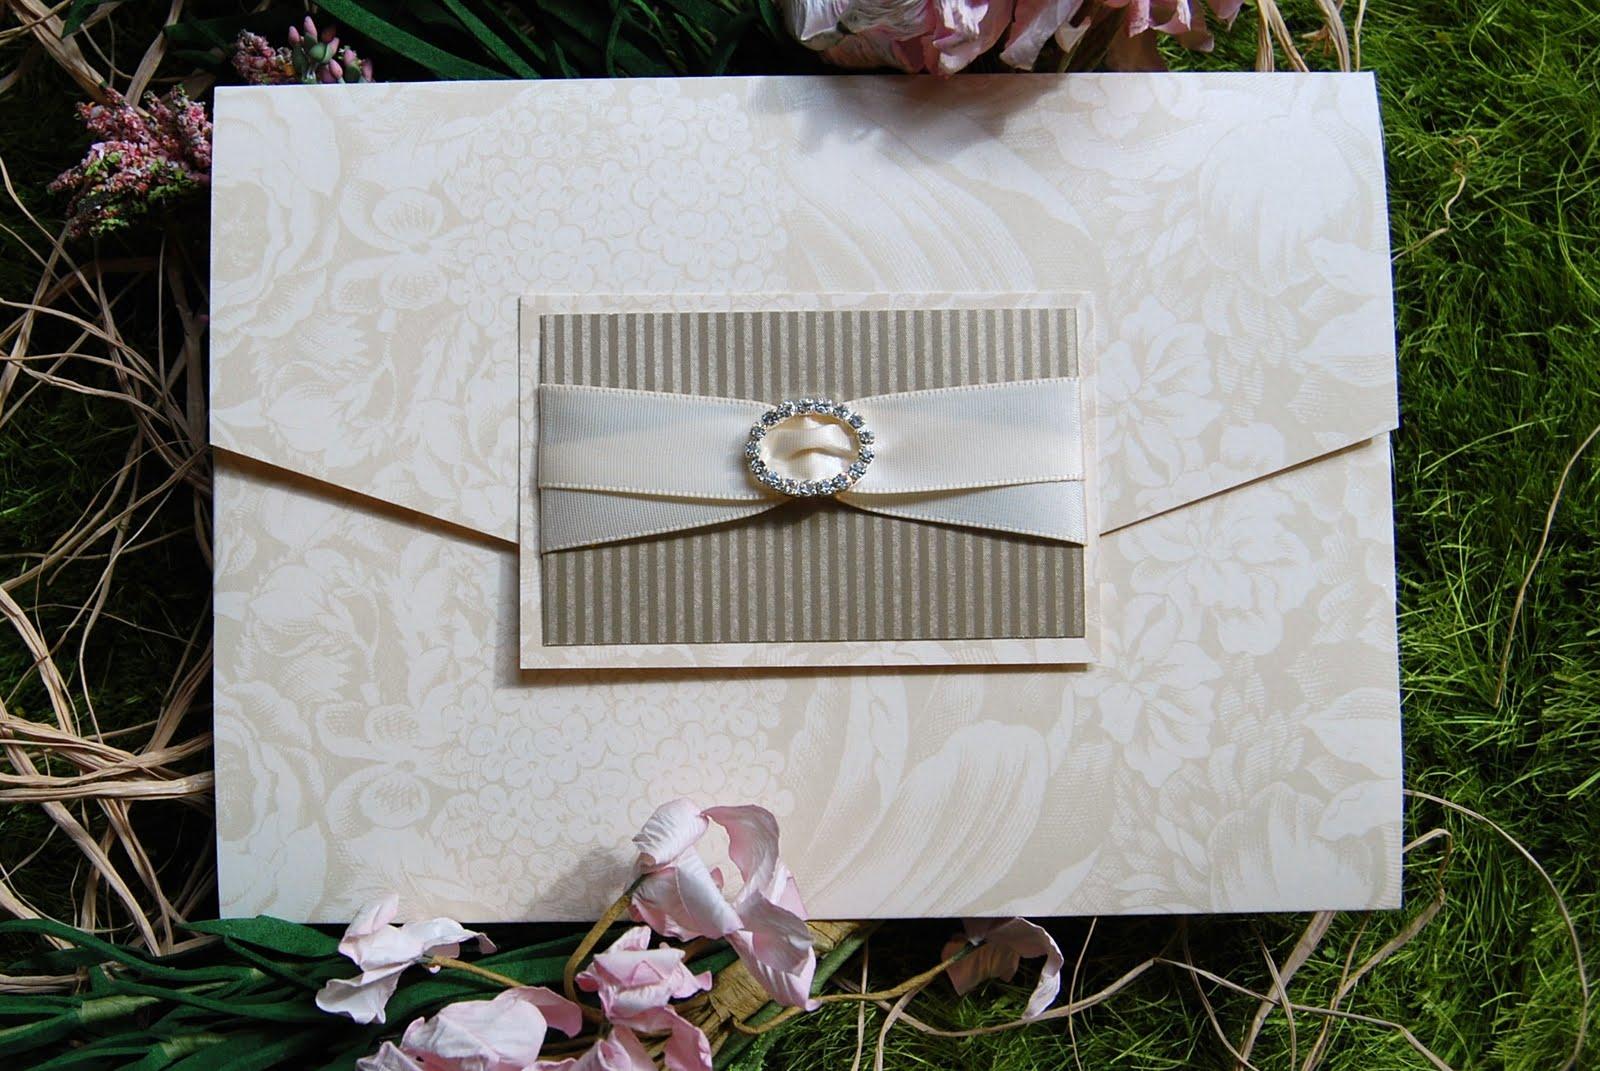 Sativa\'s blog: My Paris-themed wedding shower